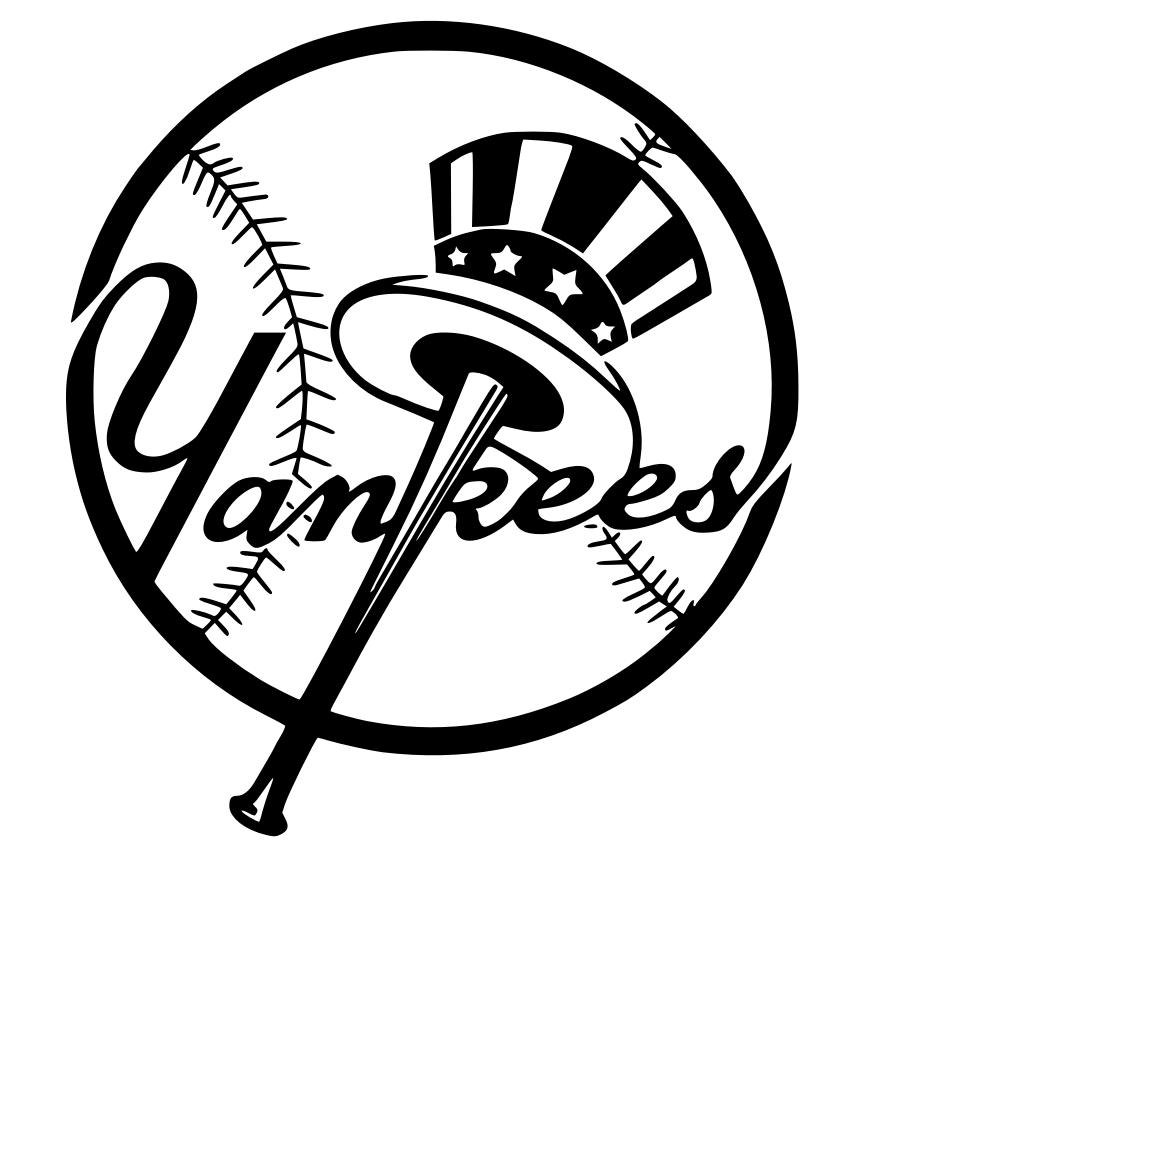 Dropbox Yankees.svg Yankees logo, New york yankees